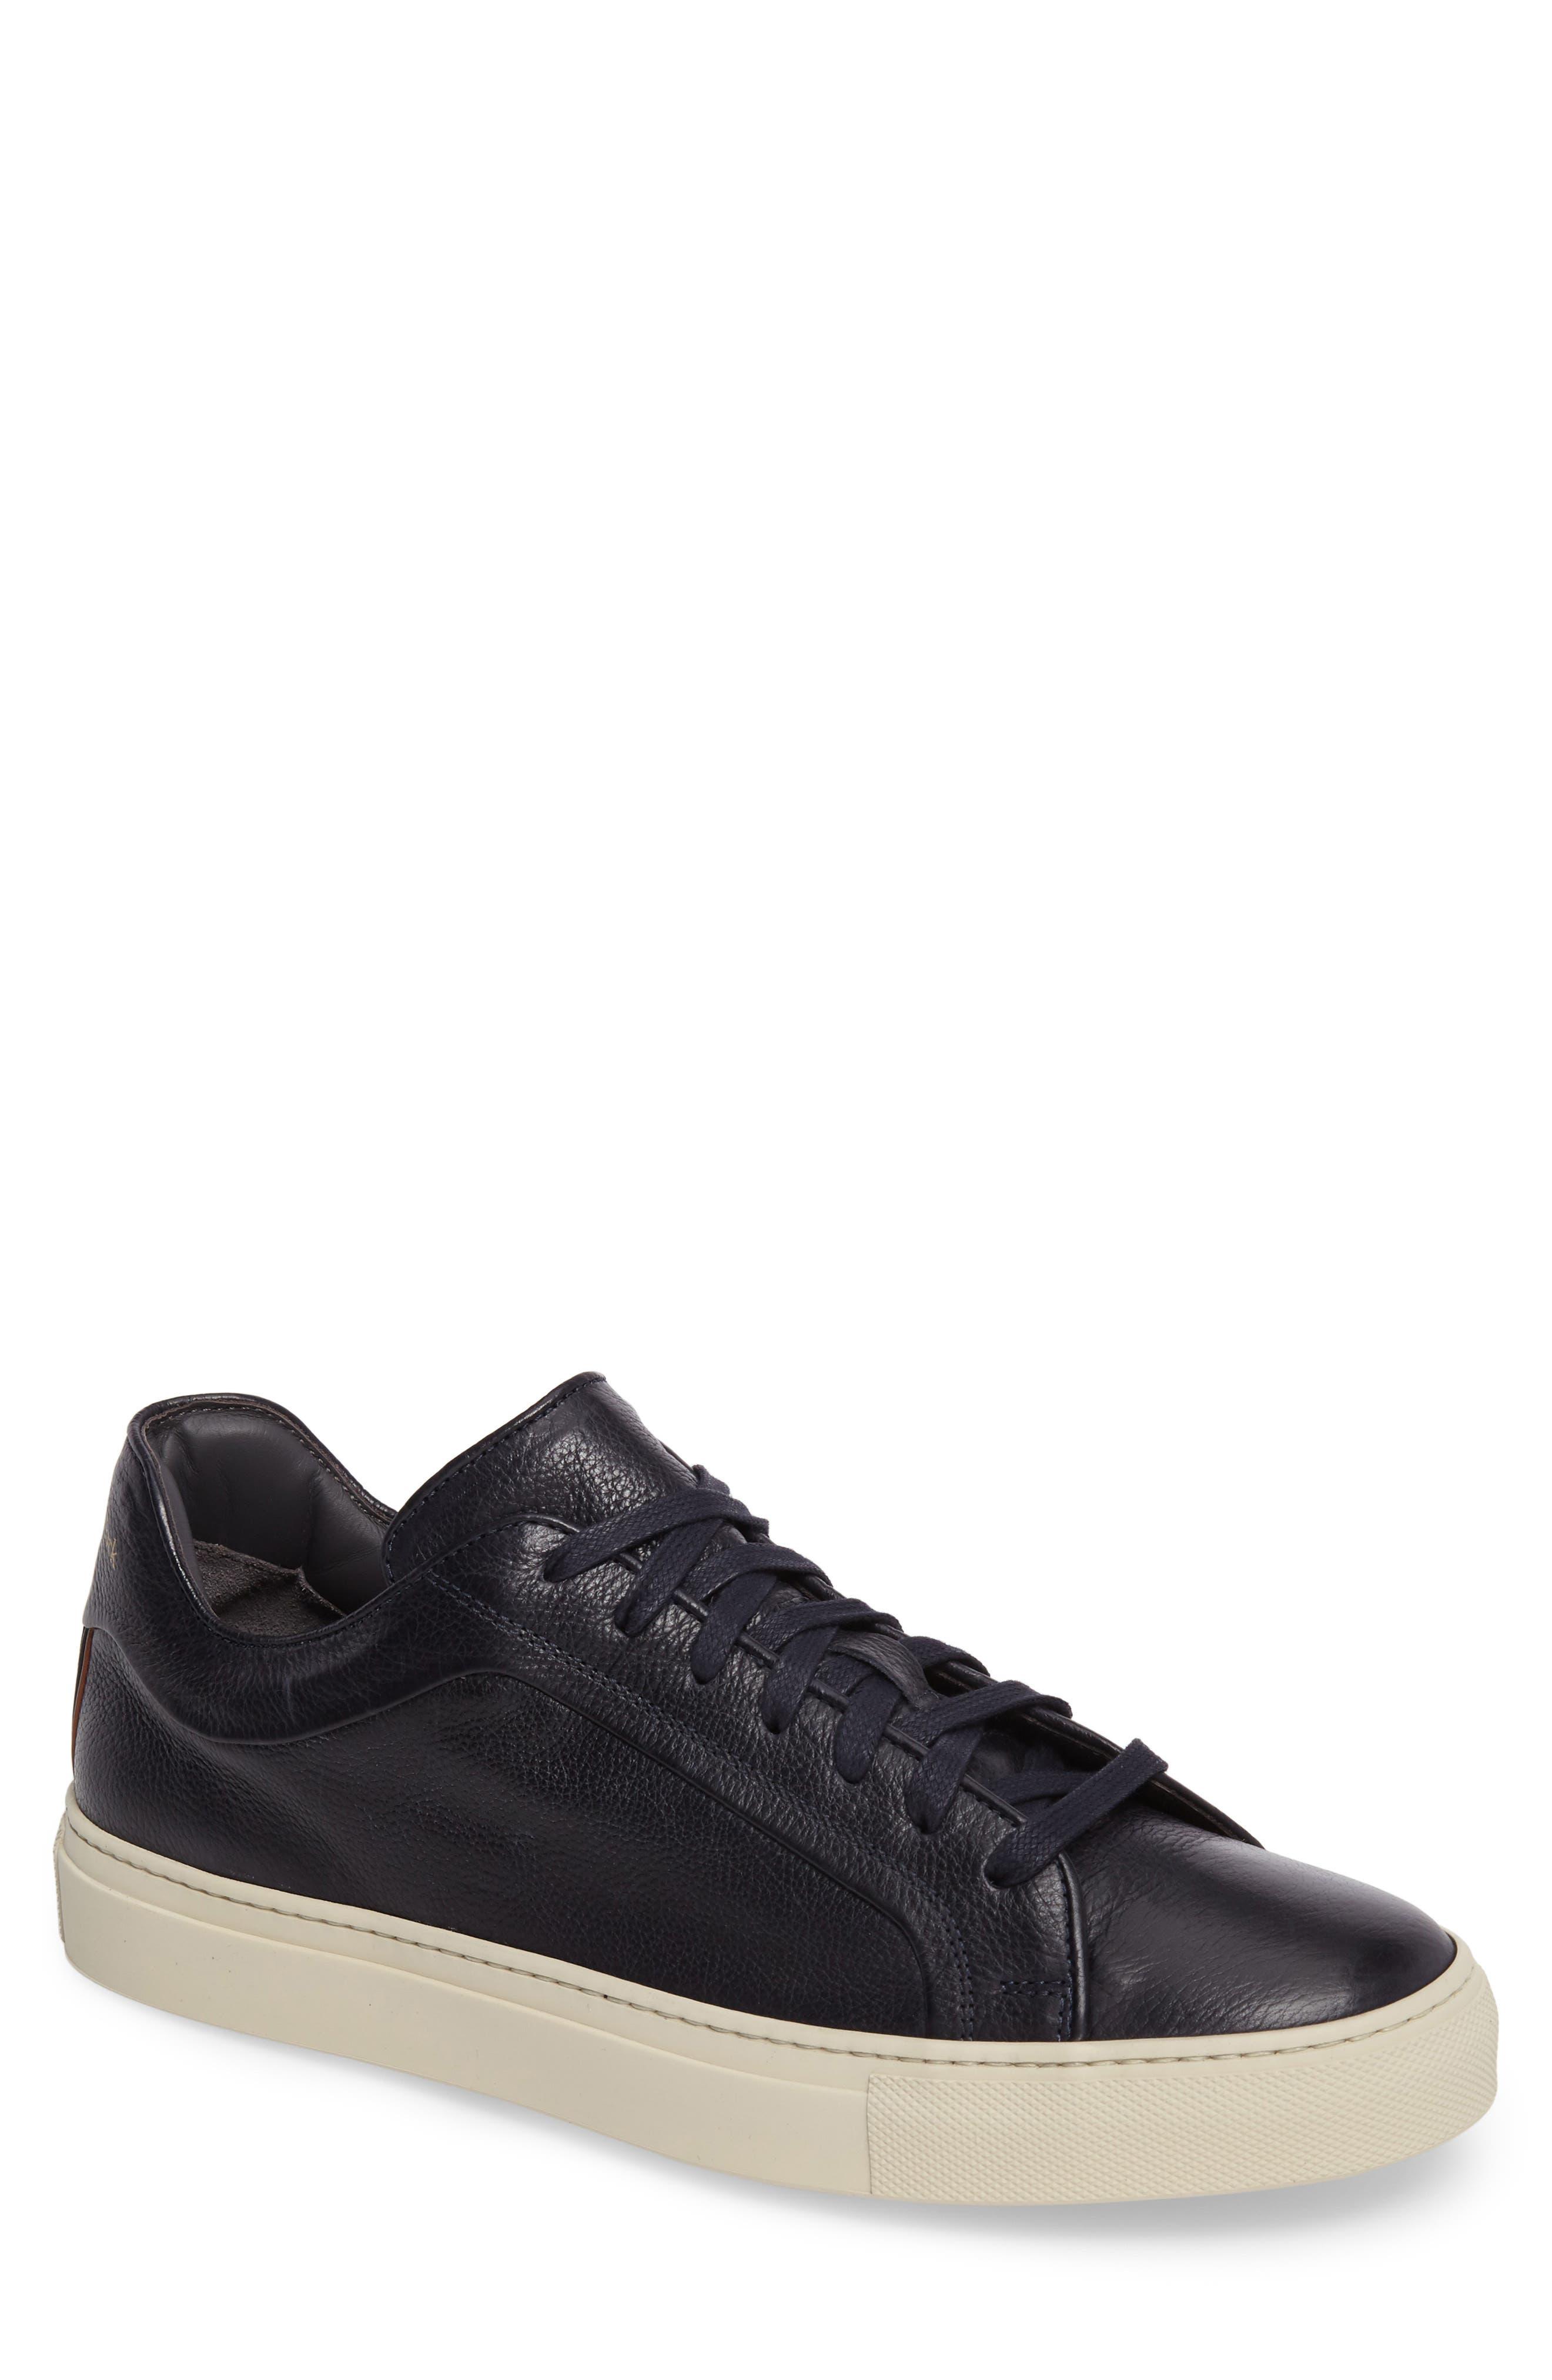 Thomas Sneaker,                             Main thumbnail 1, color,                             BLUE MARINE